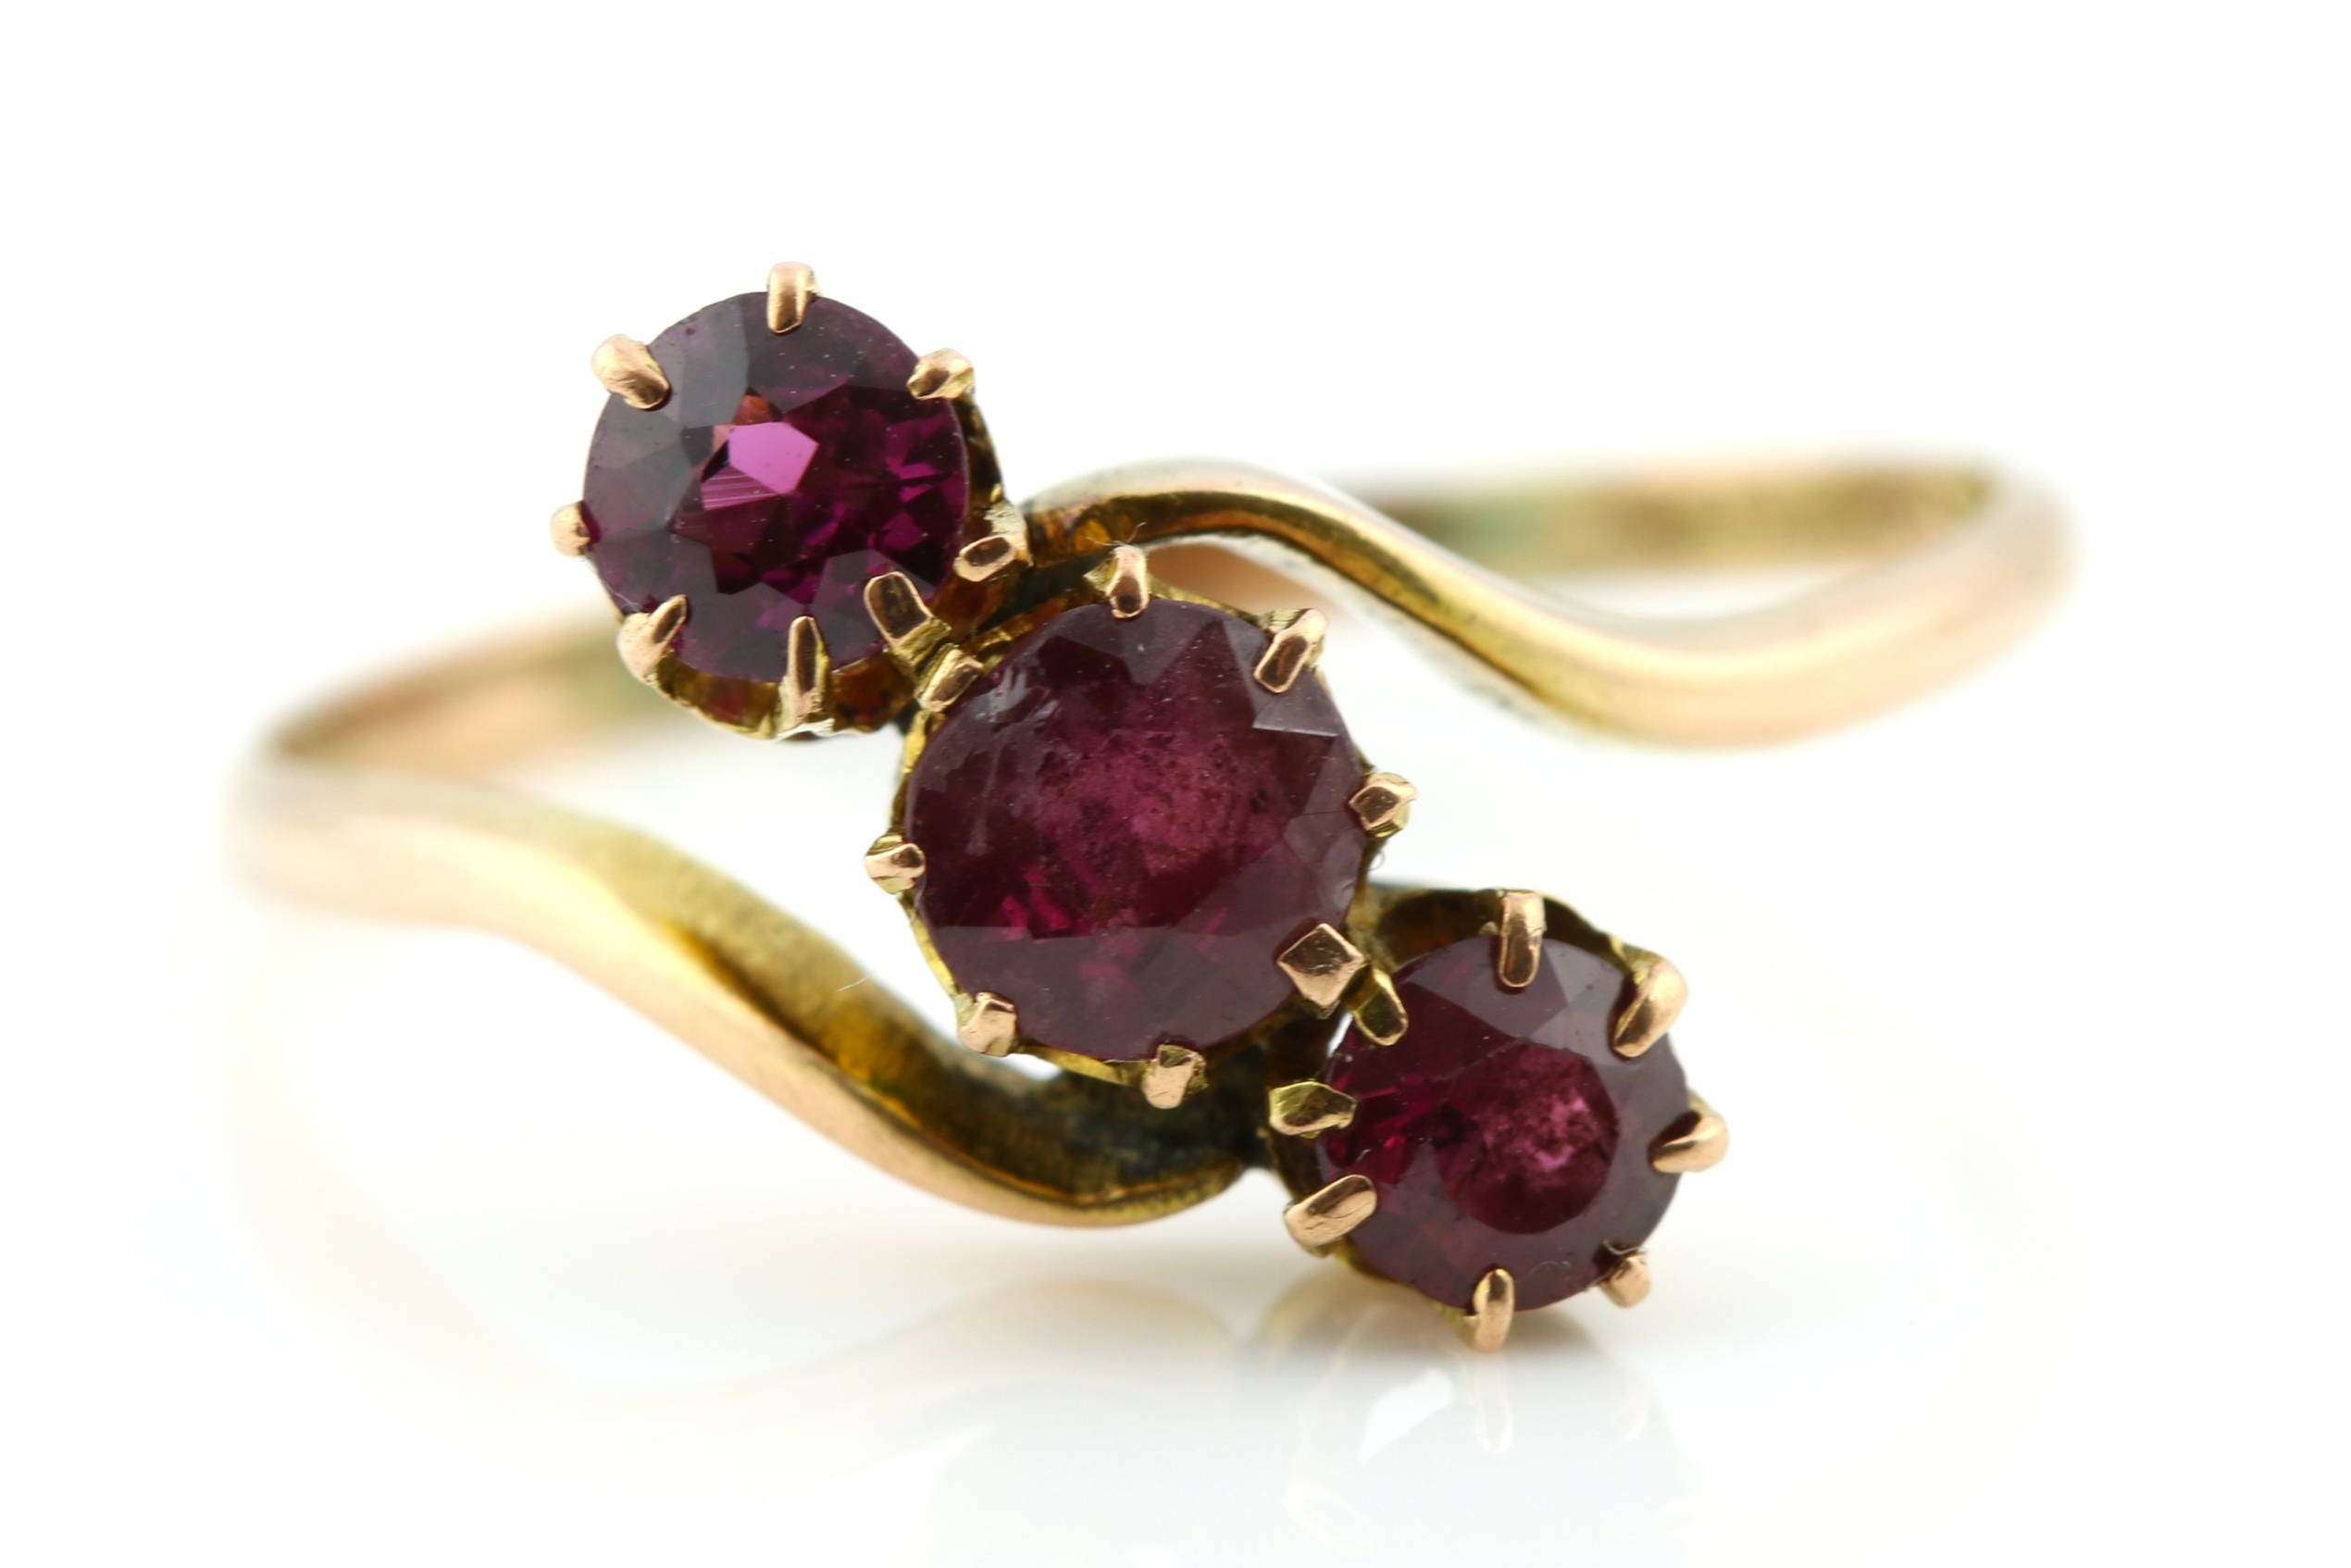 9ct Rose Gold Antique Garnet Trilogy Ring  c1900 Antique 9ct Gold 3 stone Garnet Ring Edwardian Garnet Ring